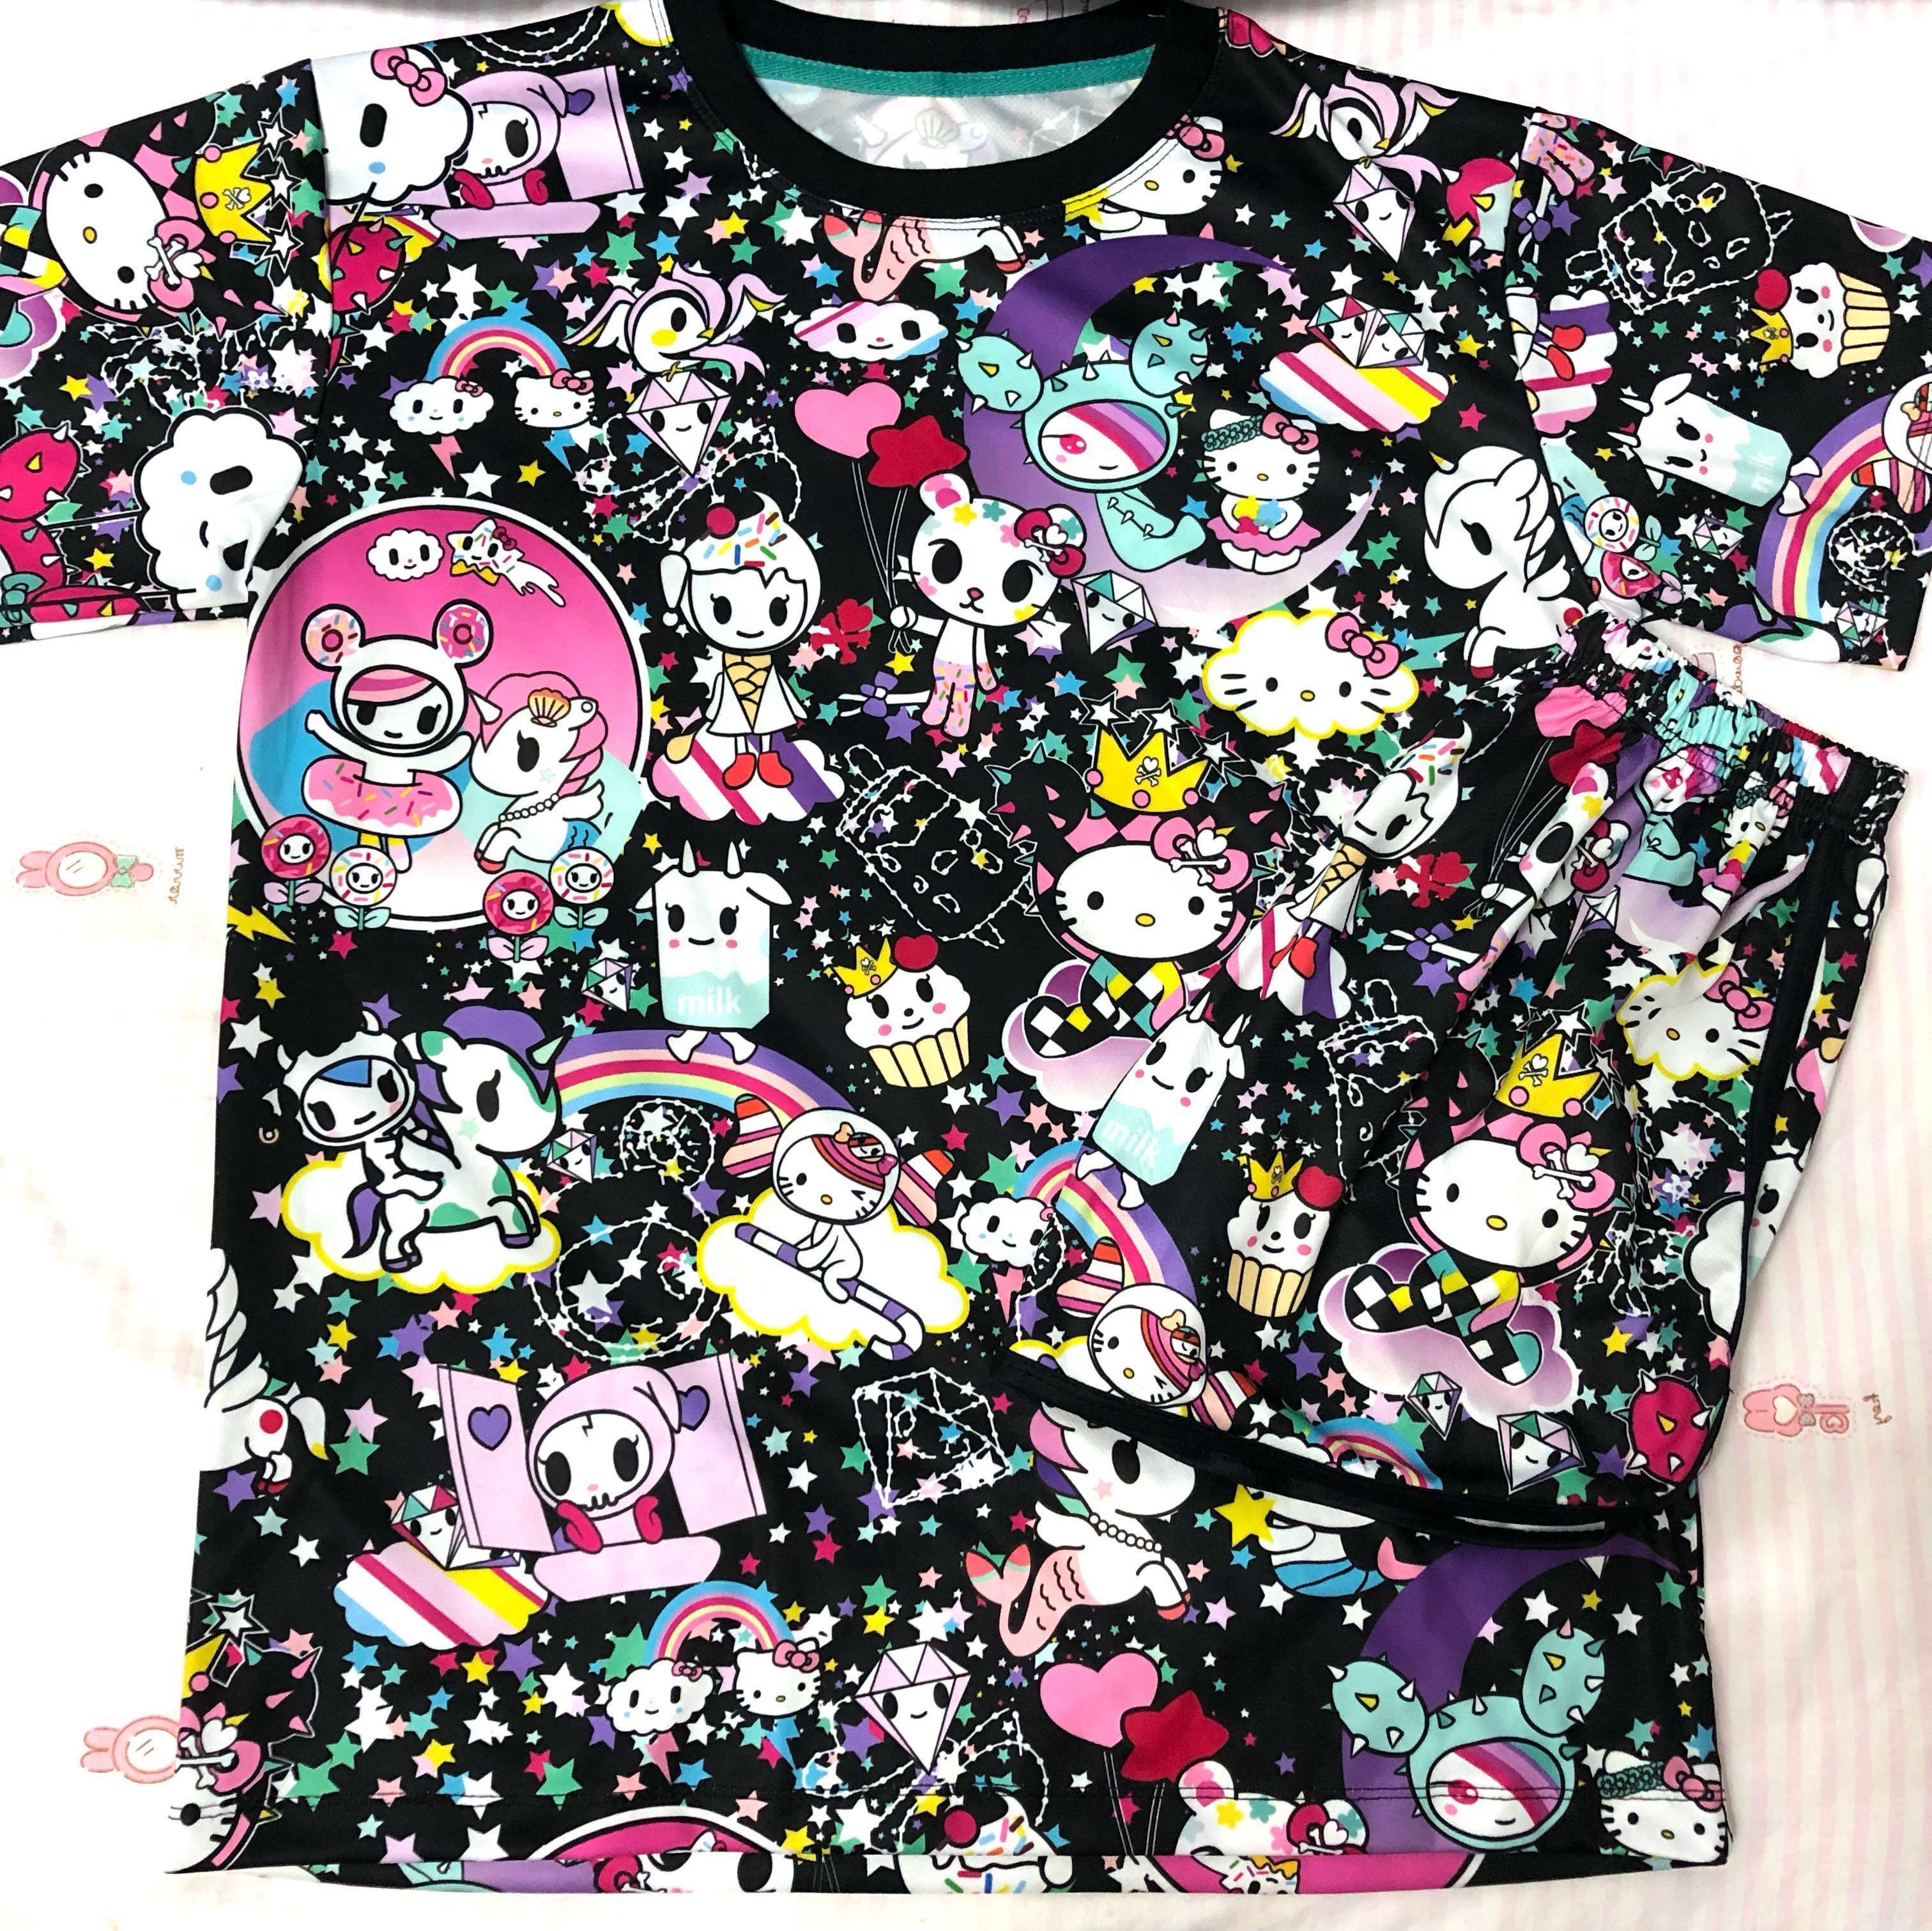 $11* Brand New Tokidoki x Hello Kitty Sleepwear Set Adult Small Size M